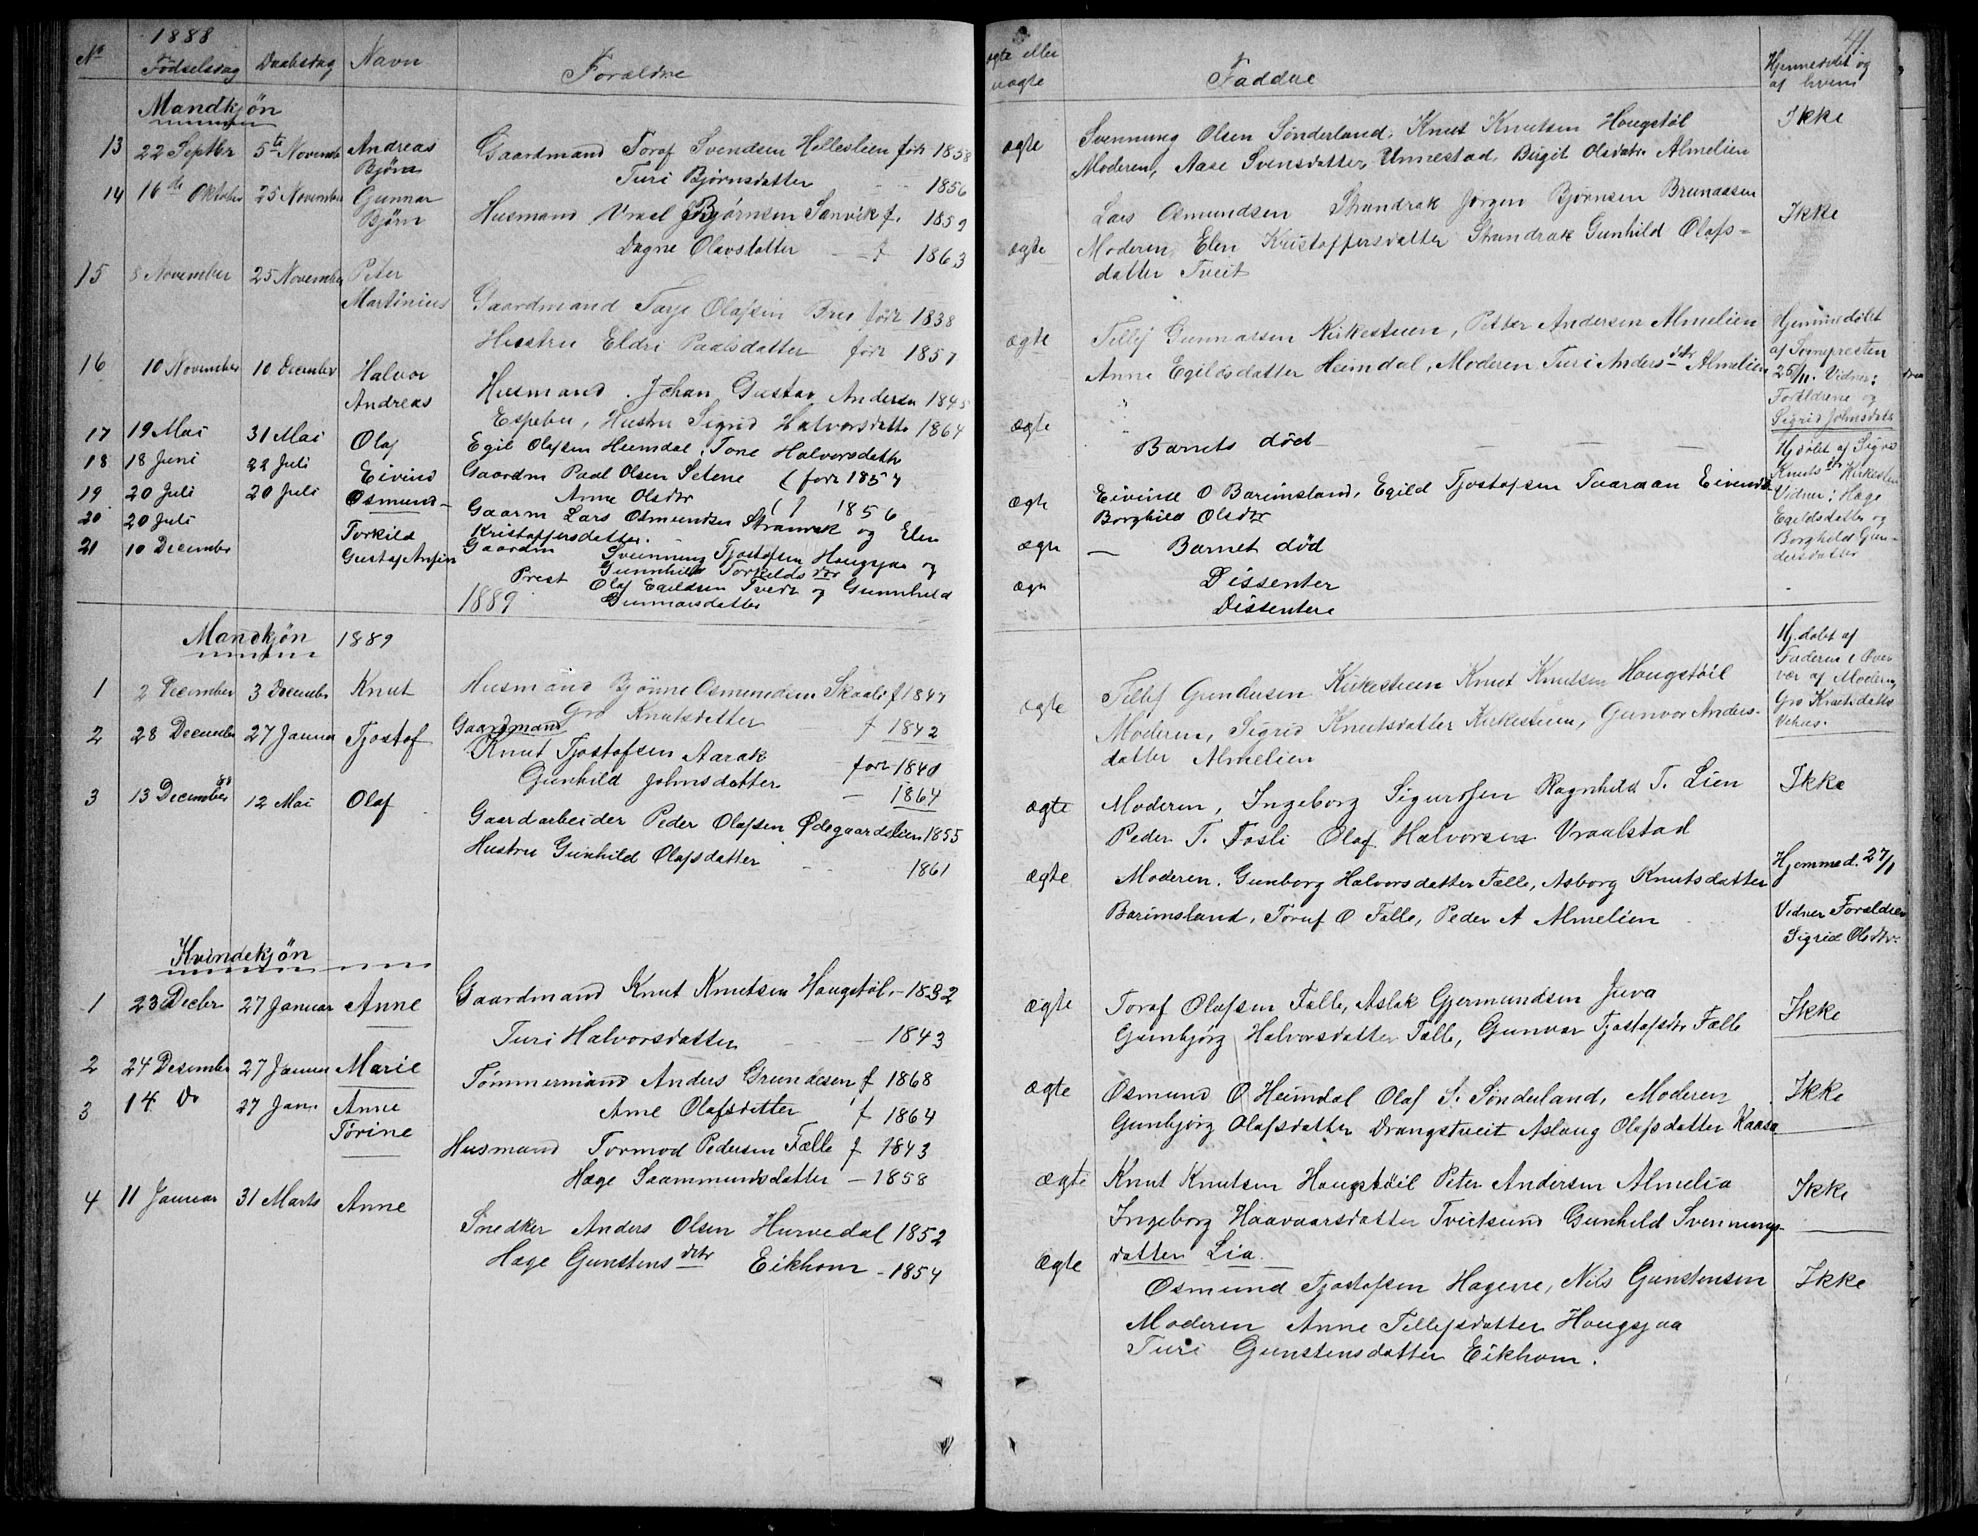 SAKO, Nissedal kirkebøker, G/Gb/L0002: Klokkerbok nr. II 2, 1863-1892, s. 41